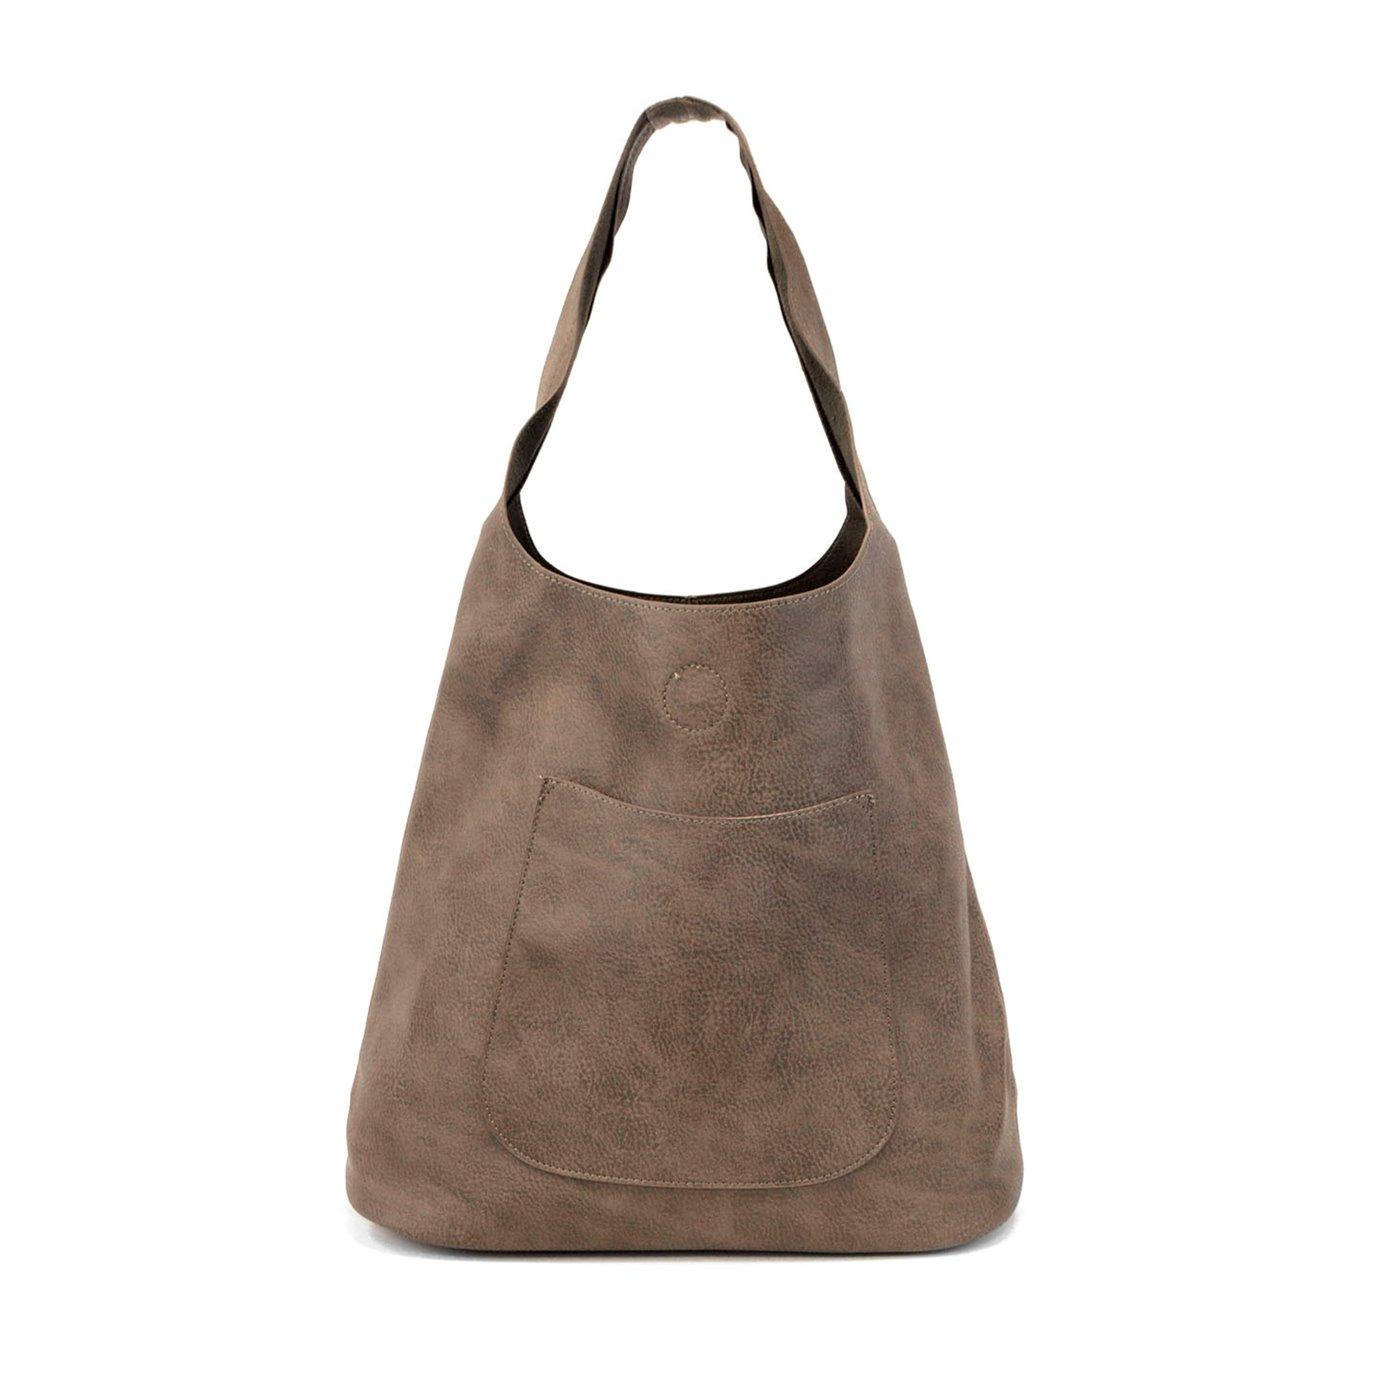 Dark Flax Molly Slouchy Hobo Handbag